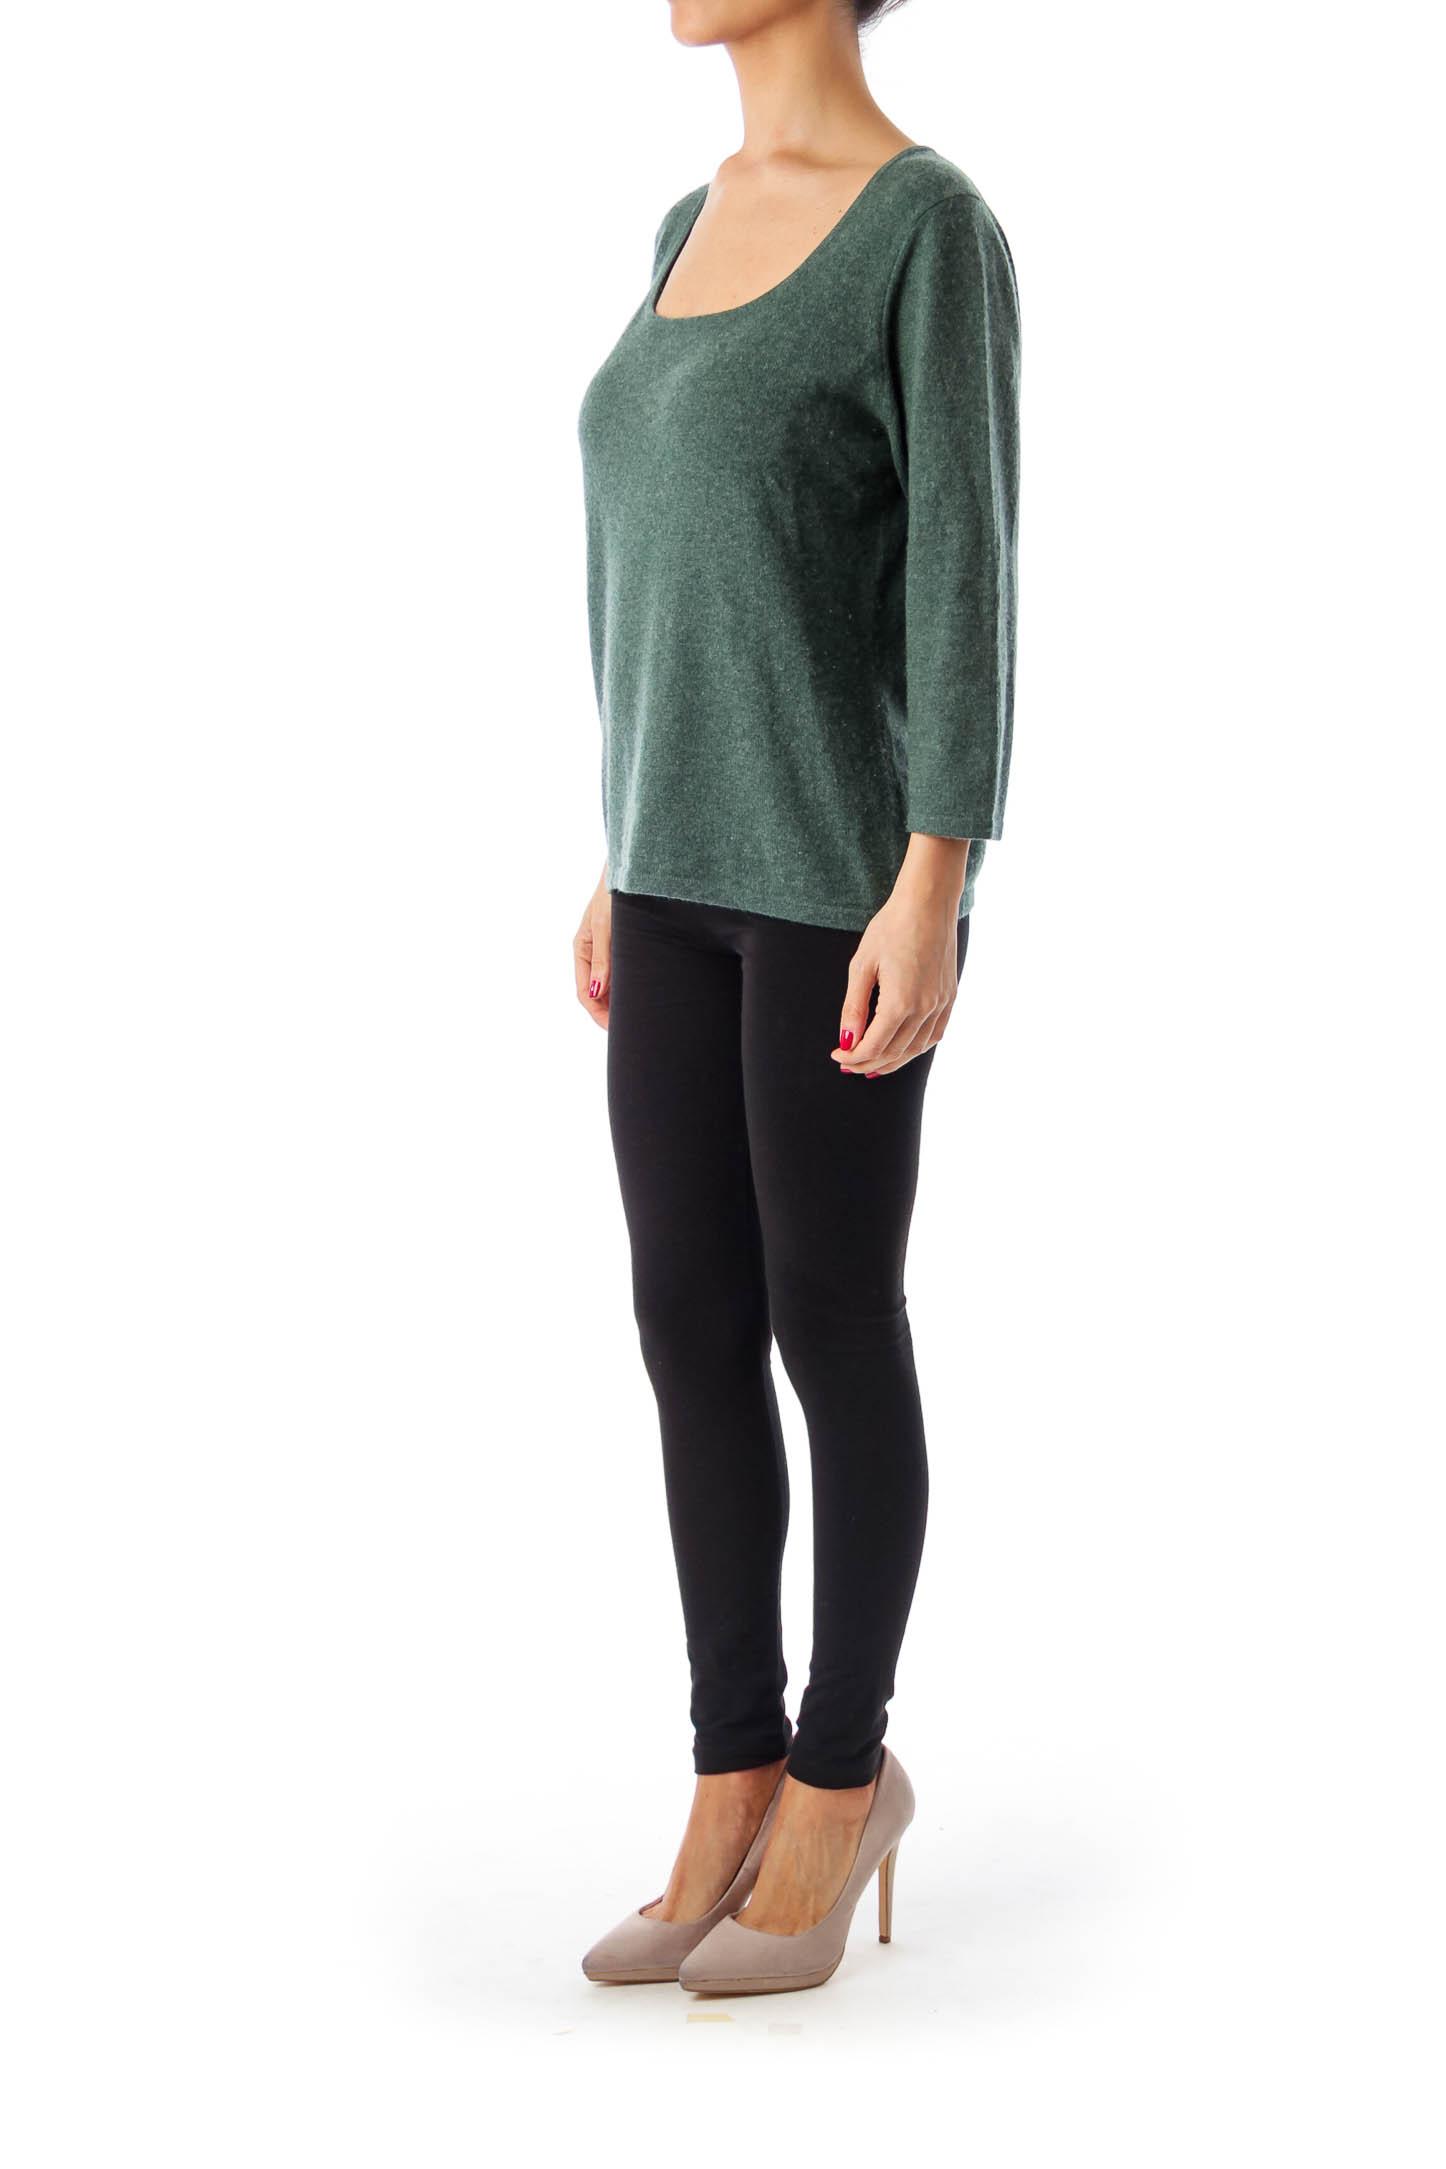 Green Cashmere Lound Neck Knit